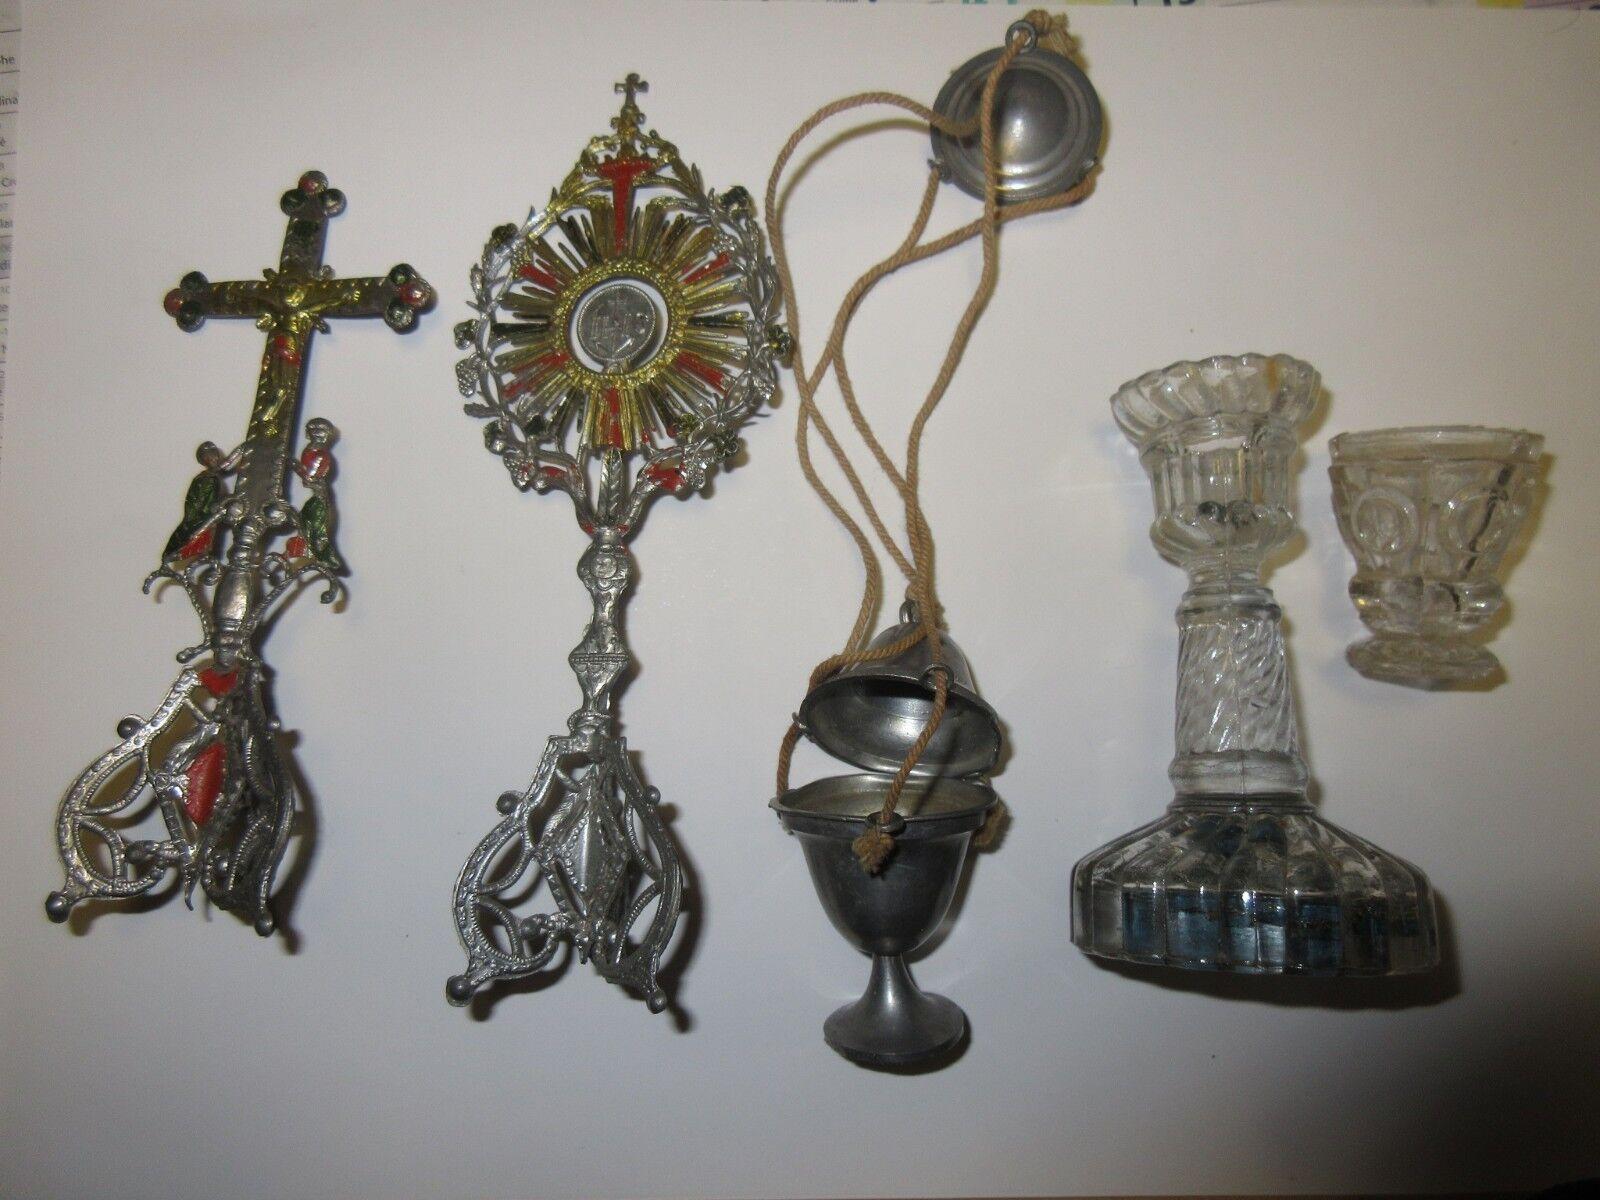 Custodia Quemador de incienso Cáliz  relicario miniaturas Juguetes